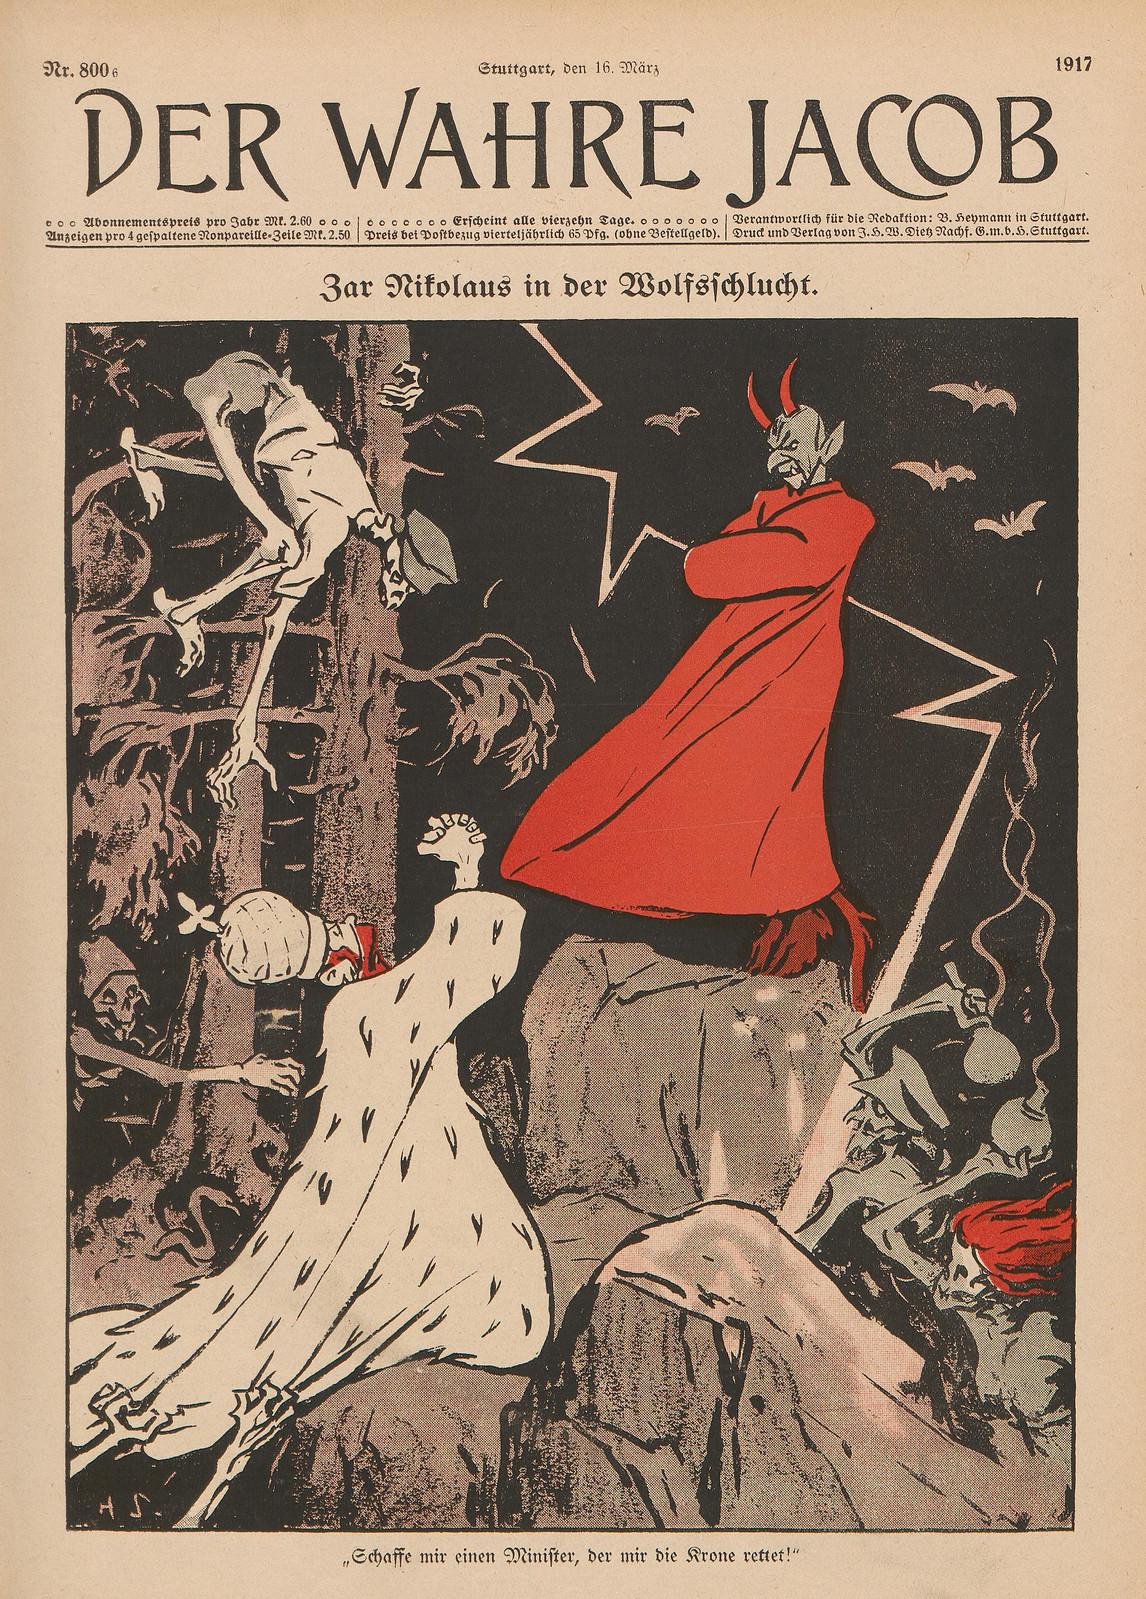 Hans Gabriel Jentzsch - Tsar Nicholas in the Wolf Gorge, 1917